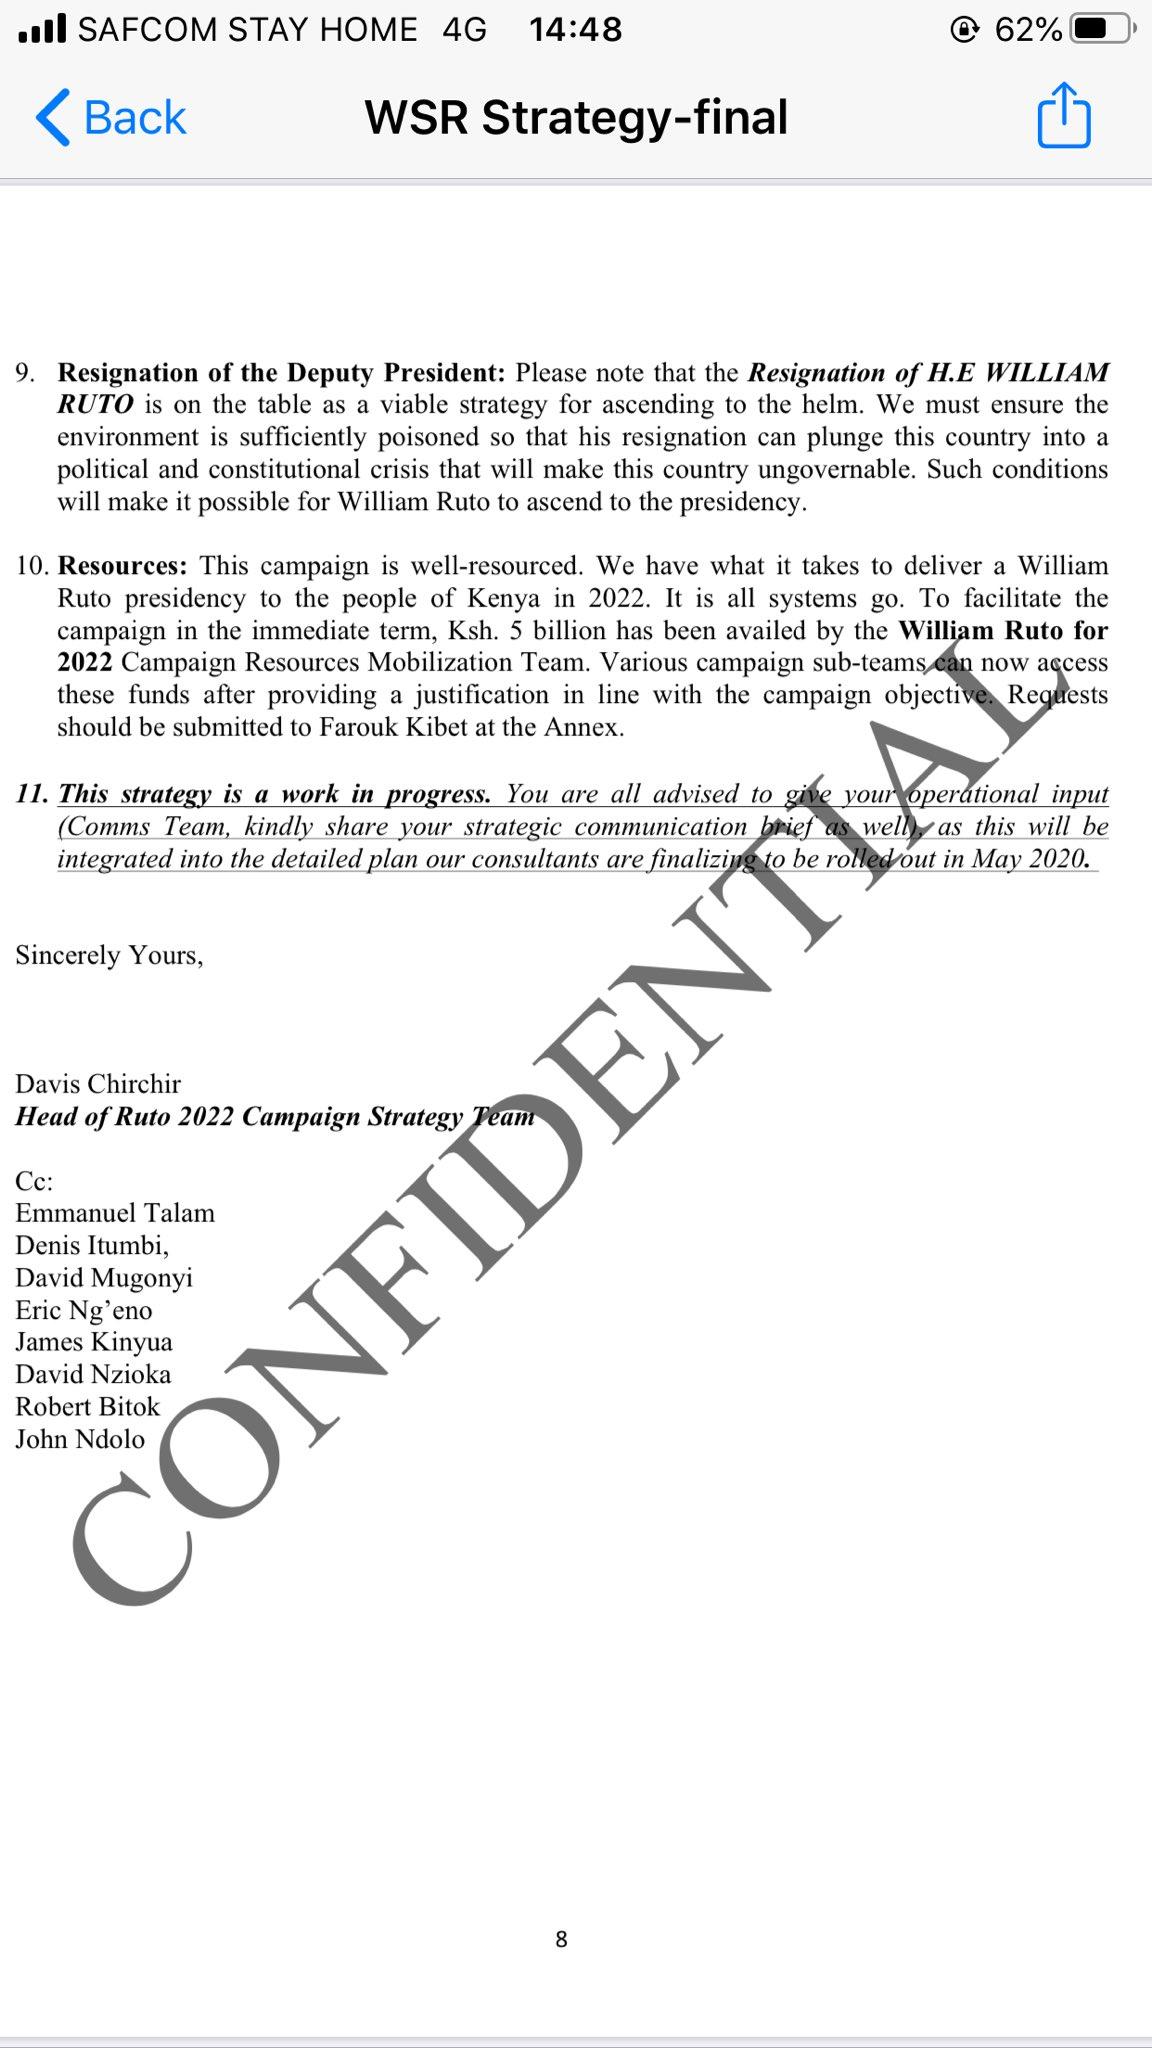 Checkout William Ruto 2022 Presidential Plan